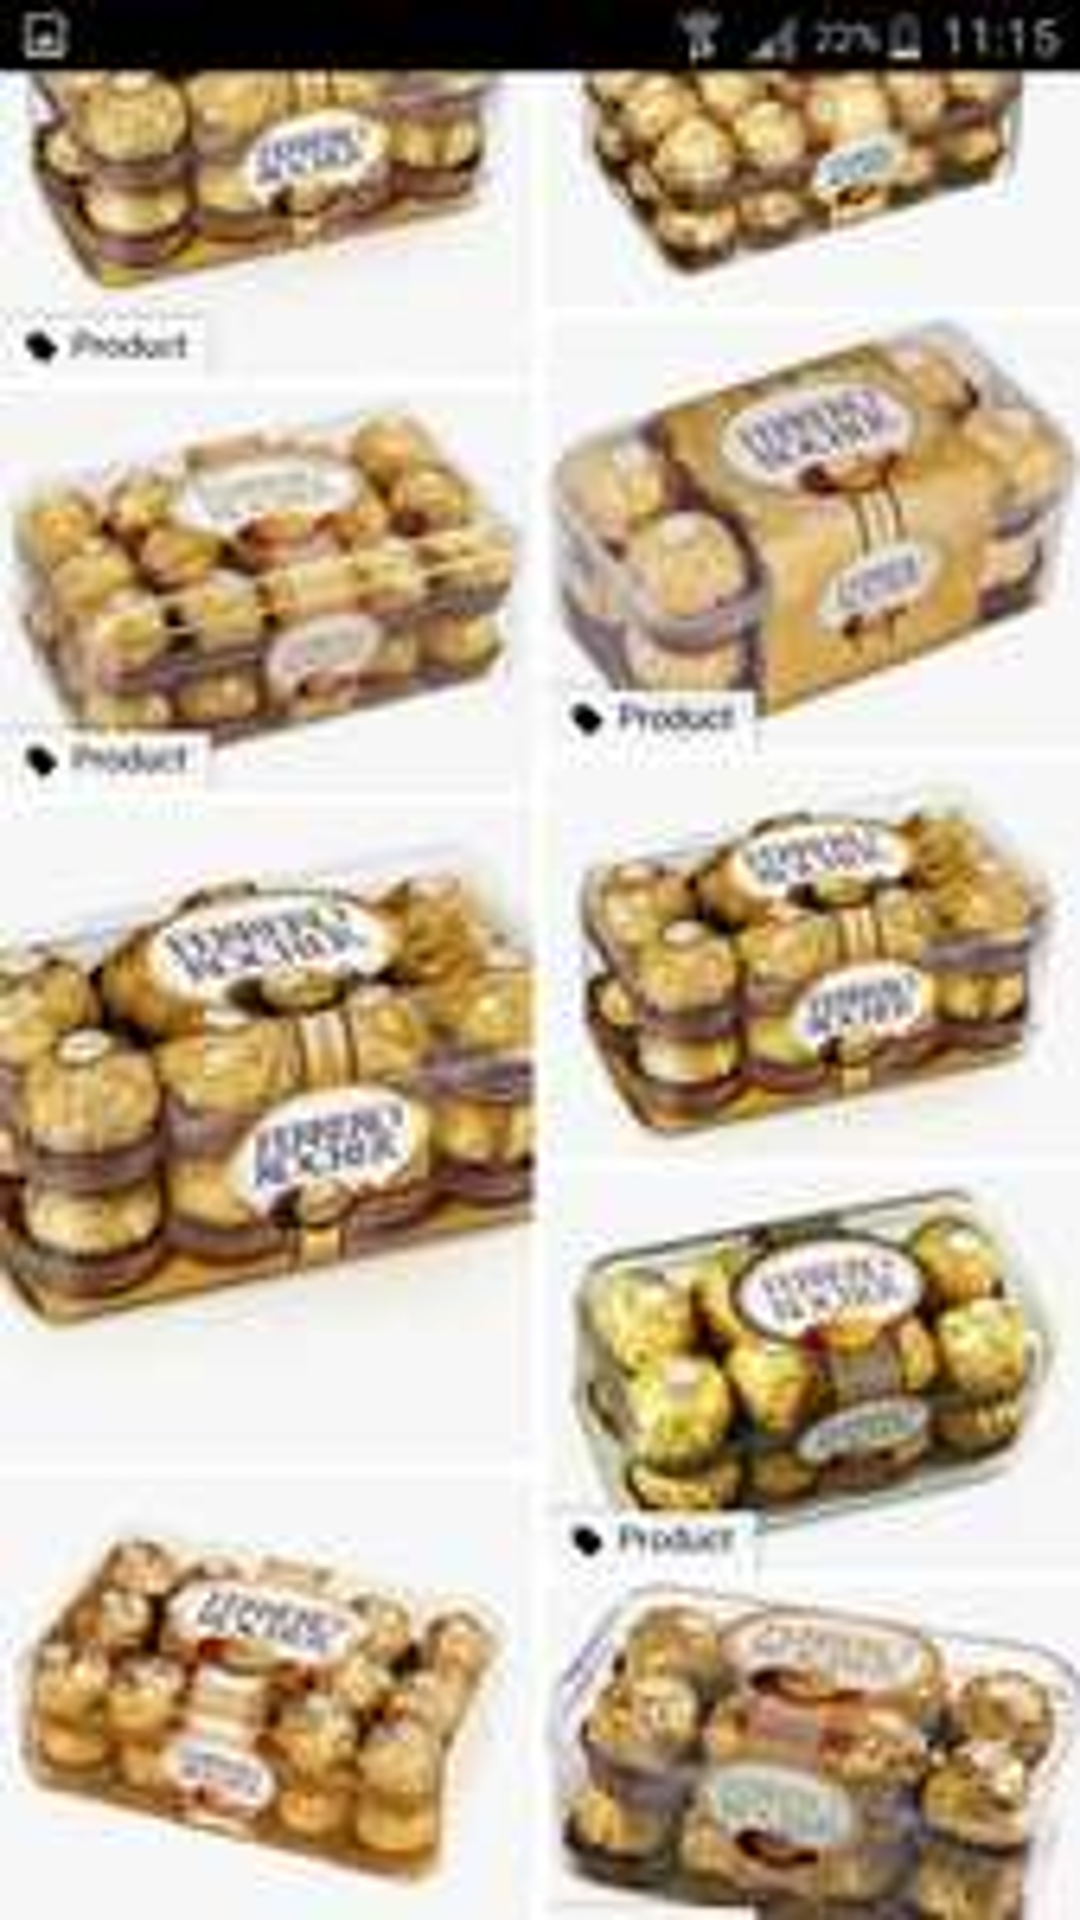 Ferrero rochers 16 pk £2 @ Asda instore